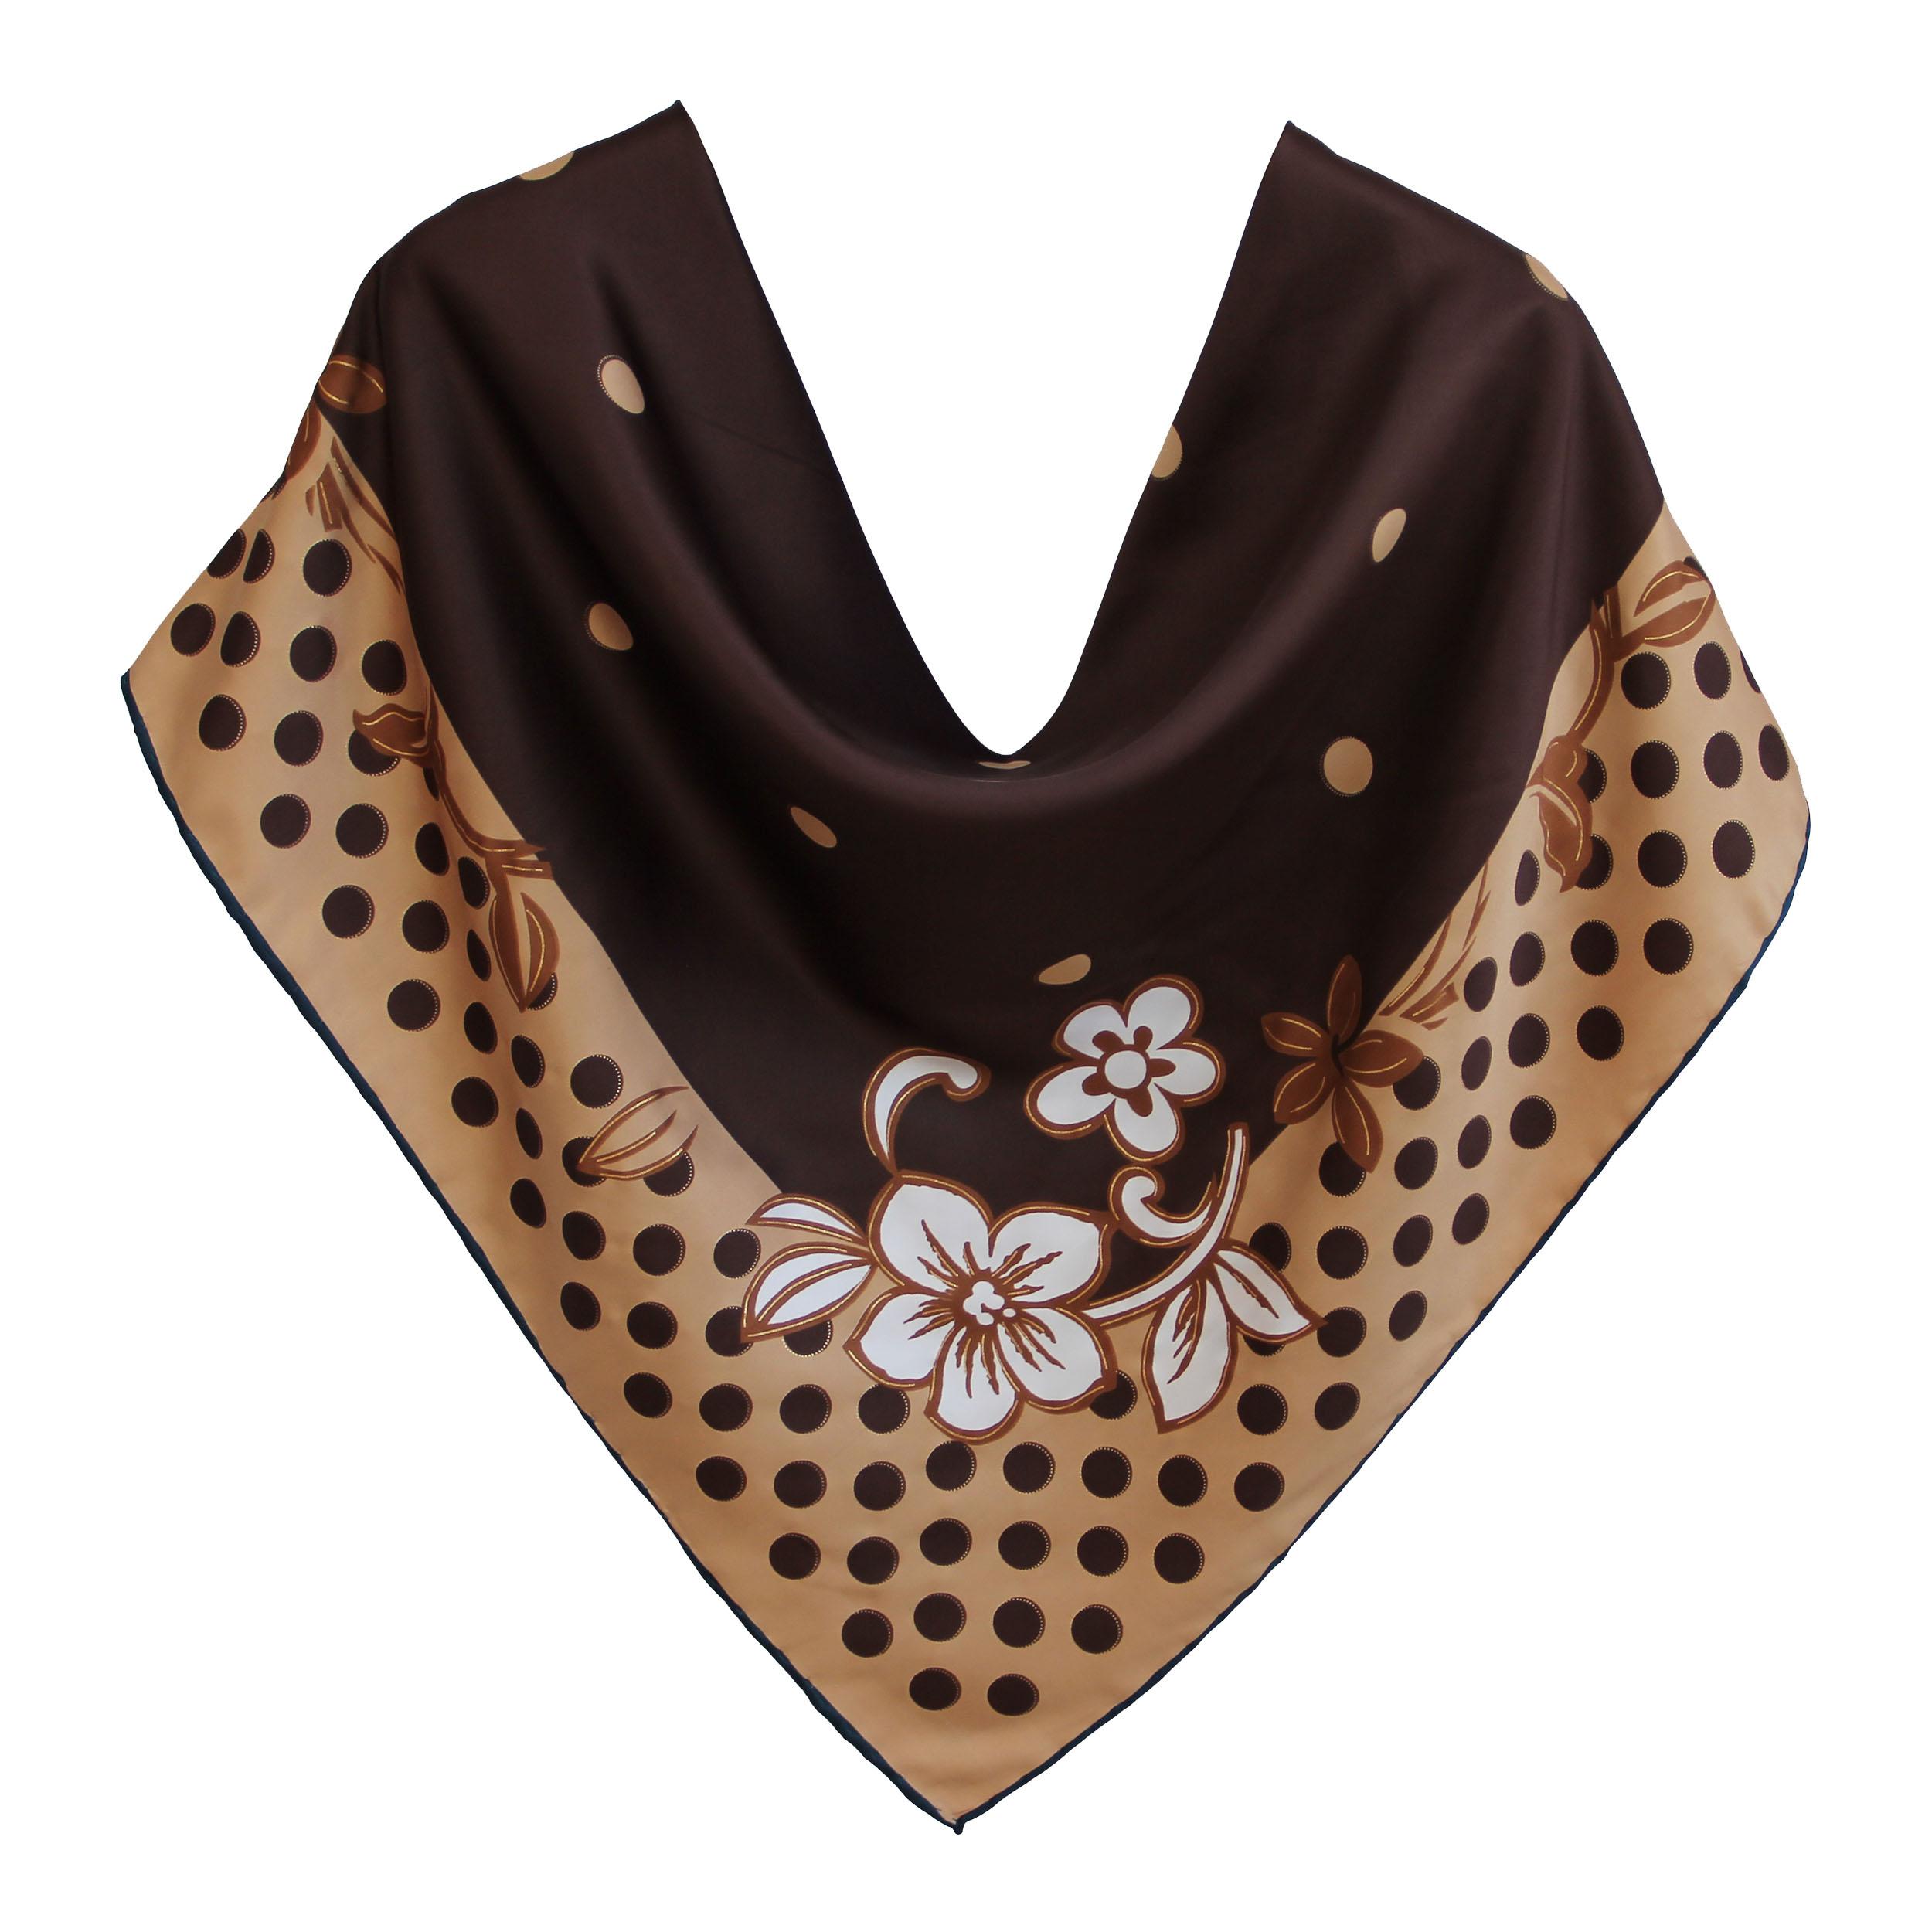 روسری زنانه توتو کد 1004